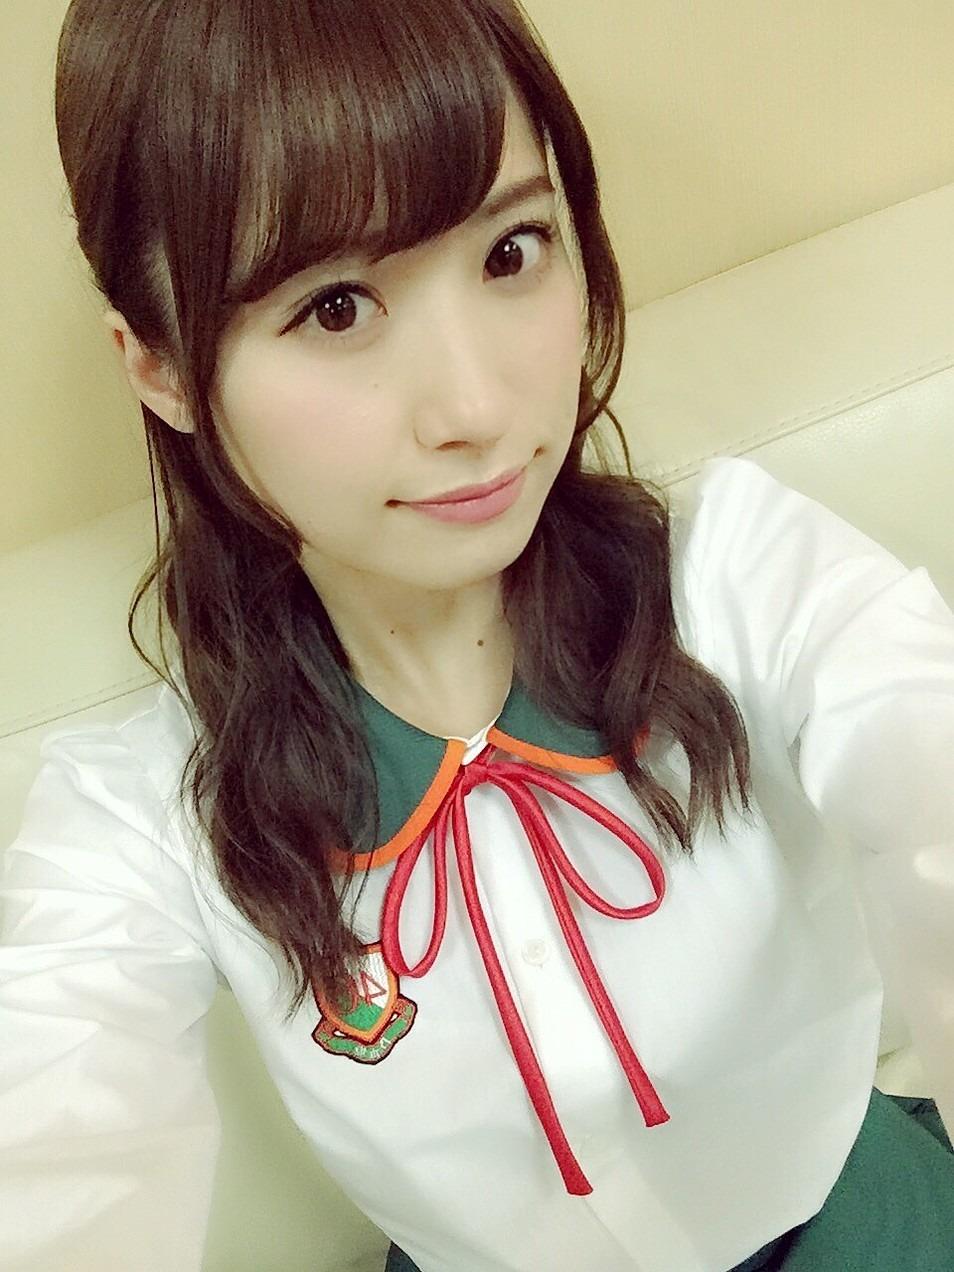 〆 ⌒⌒ ♡♡ ➳ NNの画像 プリ画像 いいね1 完全無料画像検索のプリ画像 byGMO